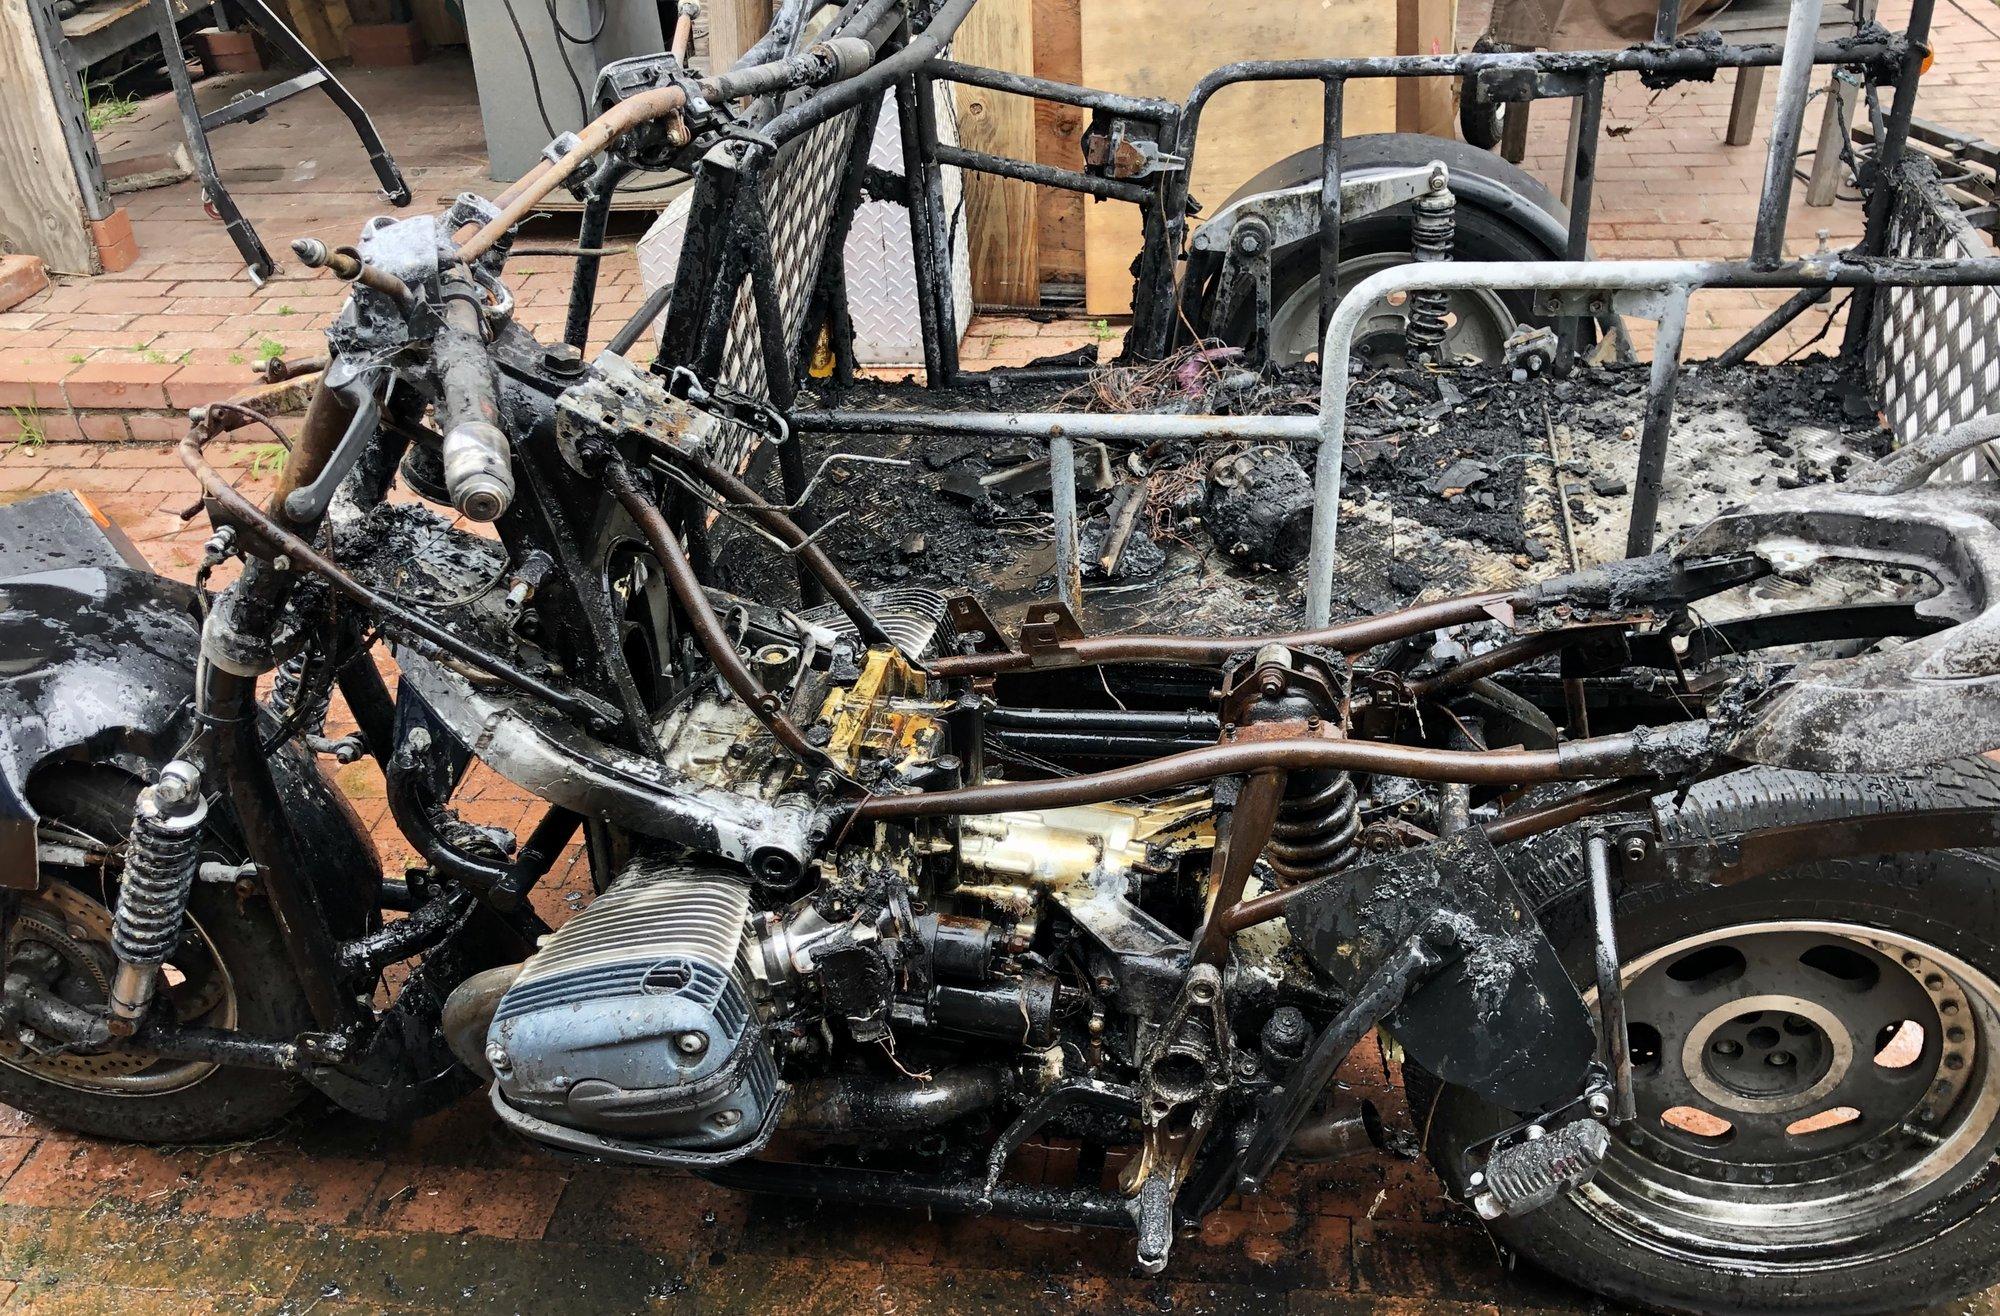 sidecar burned.jpg